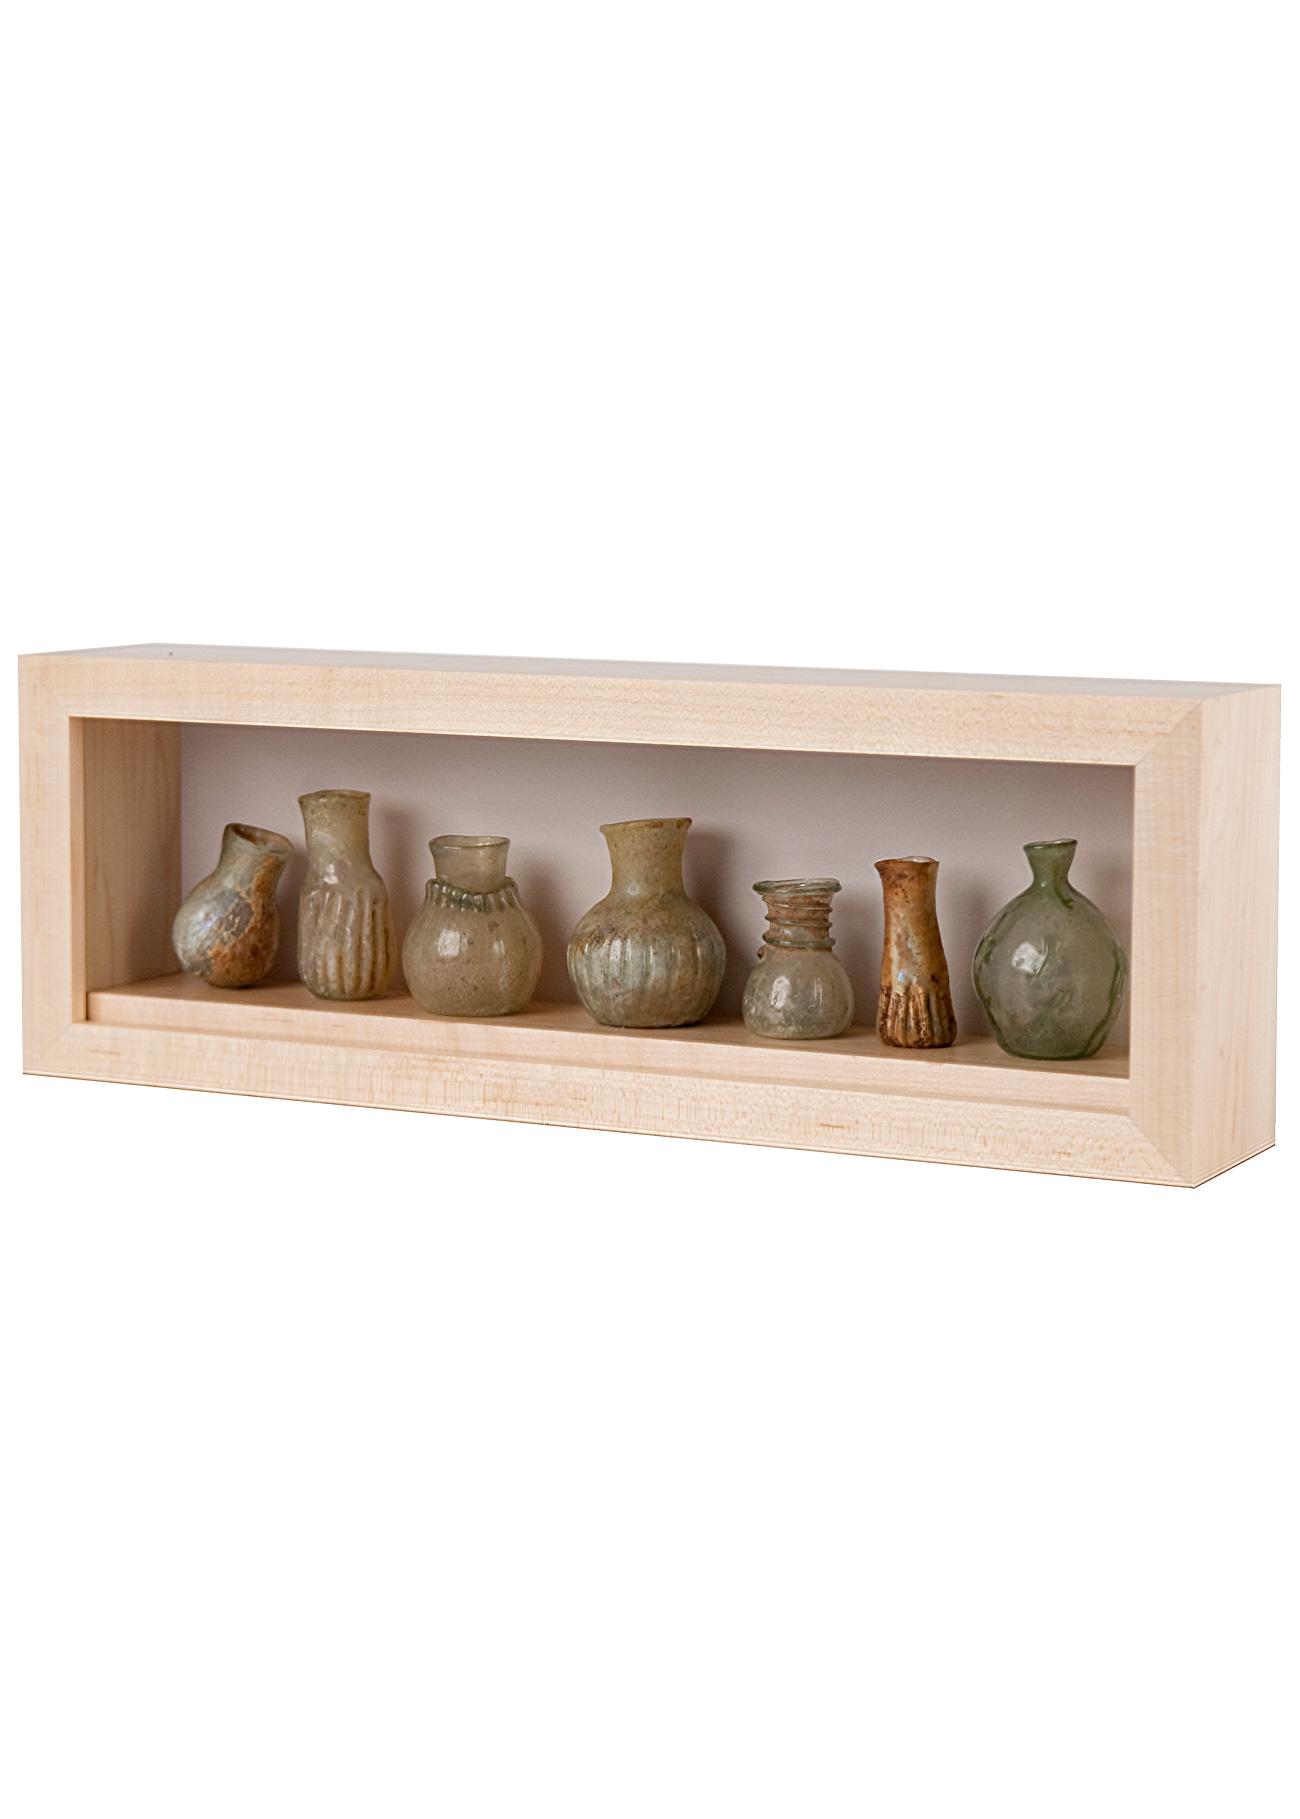 Vase Shadow Box